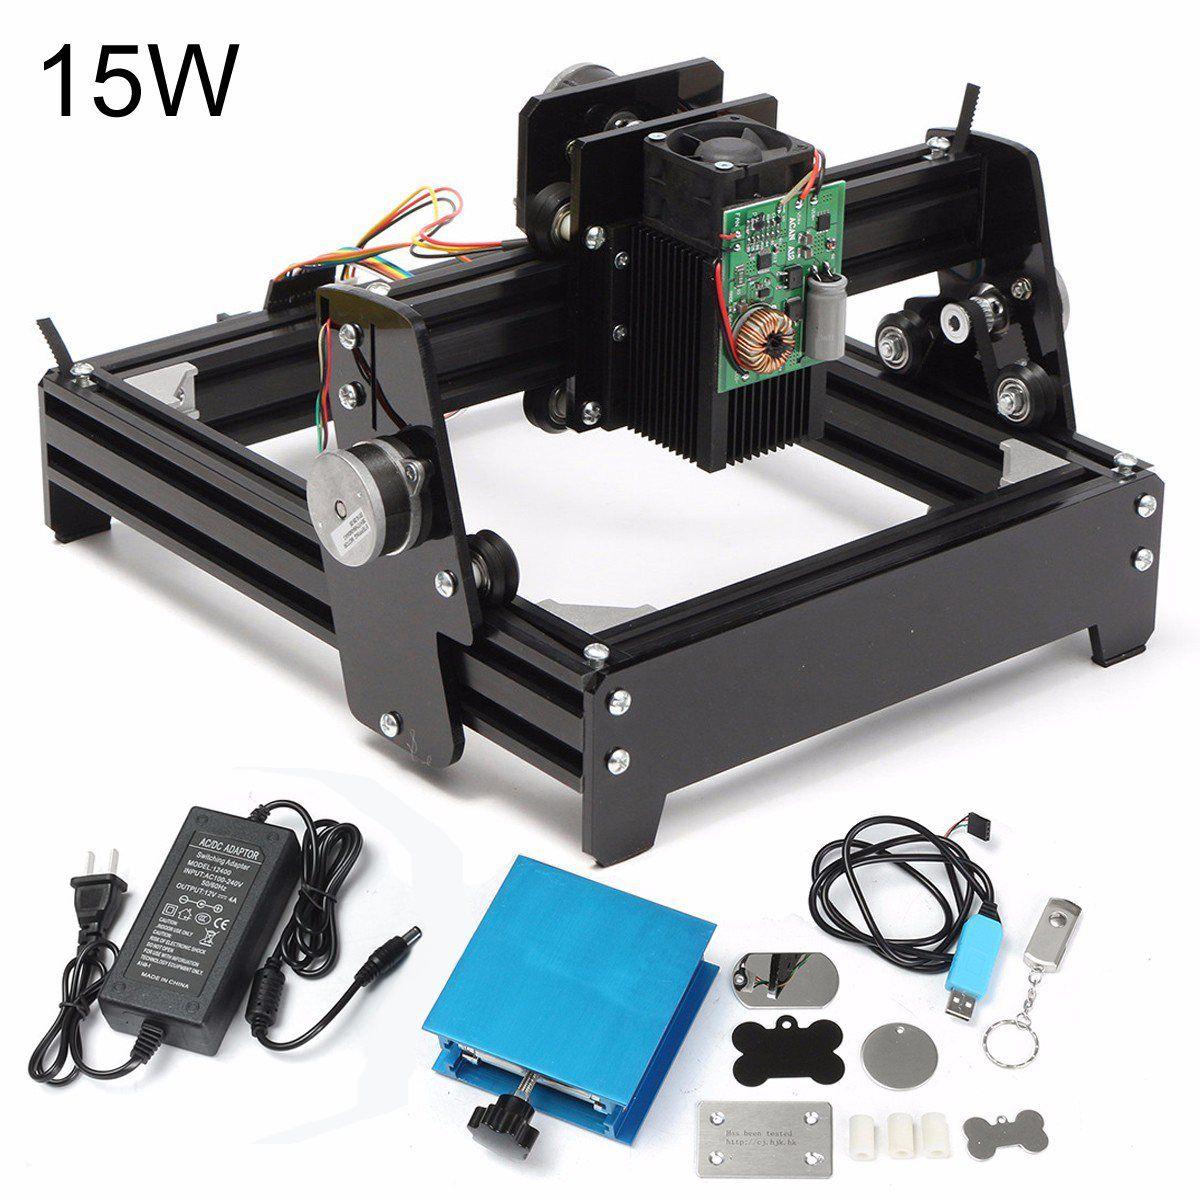 15W Laser AS-5 USB Desktop 15000mW CNC Laser Engraver DIY Marking Machine For Metal Stone Wood Engraving Area 14 x 20cm